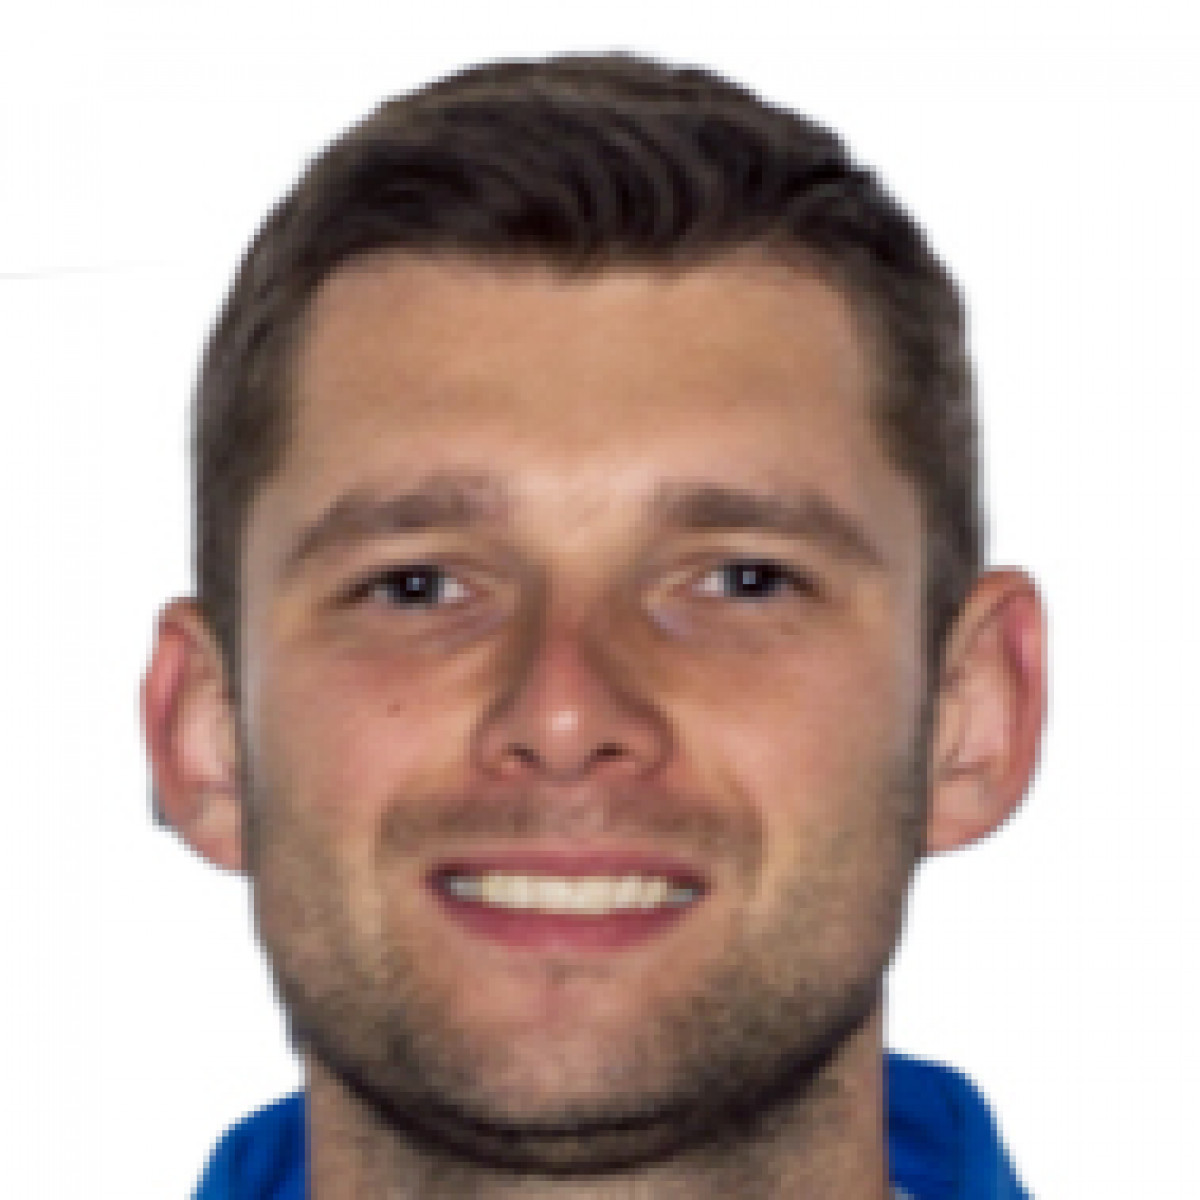 Tomasz Smorawinski